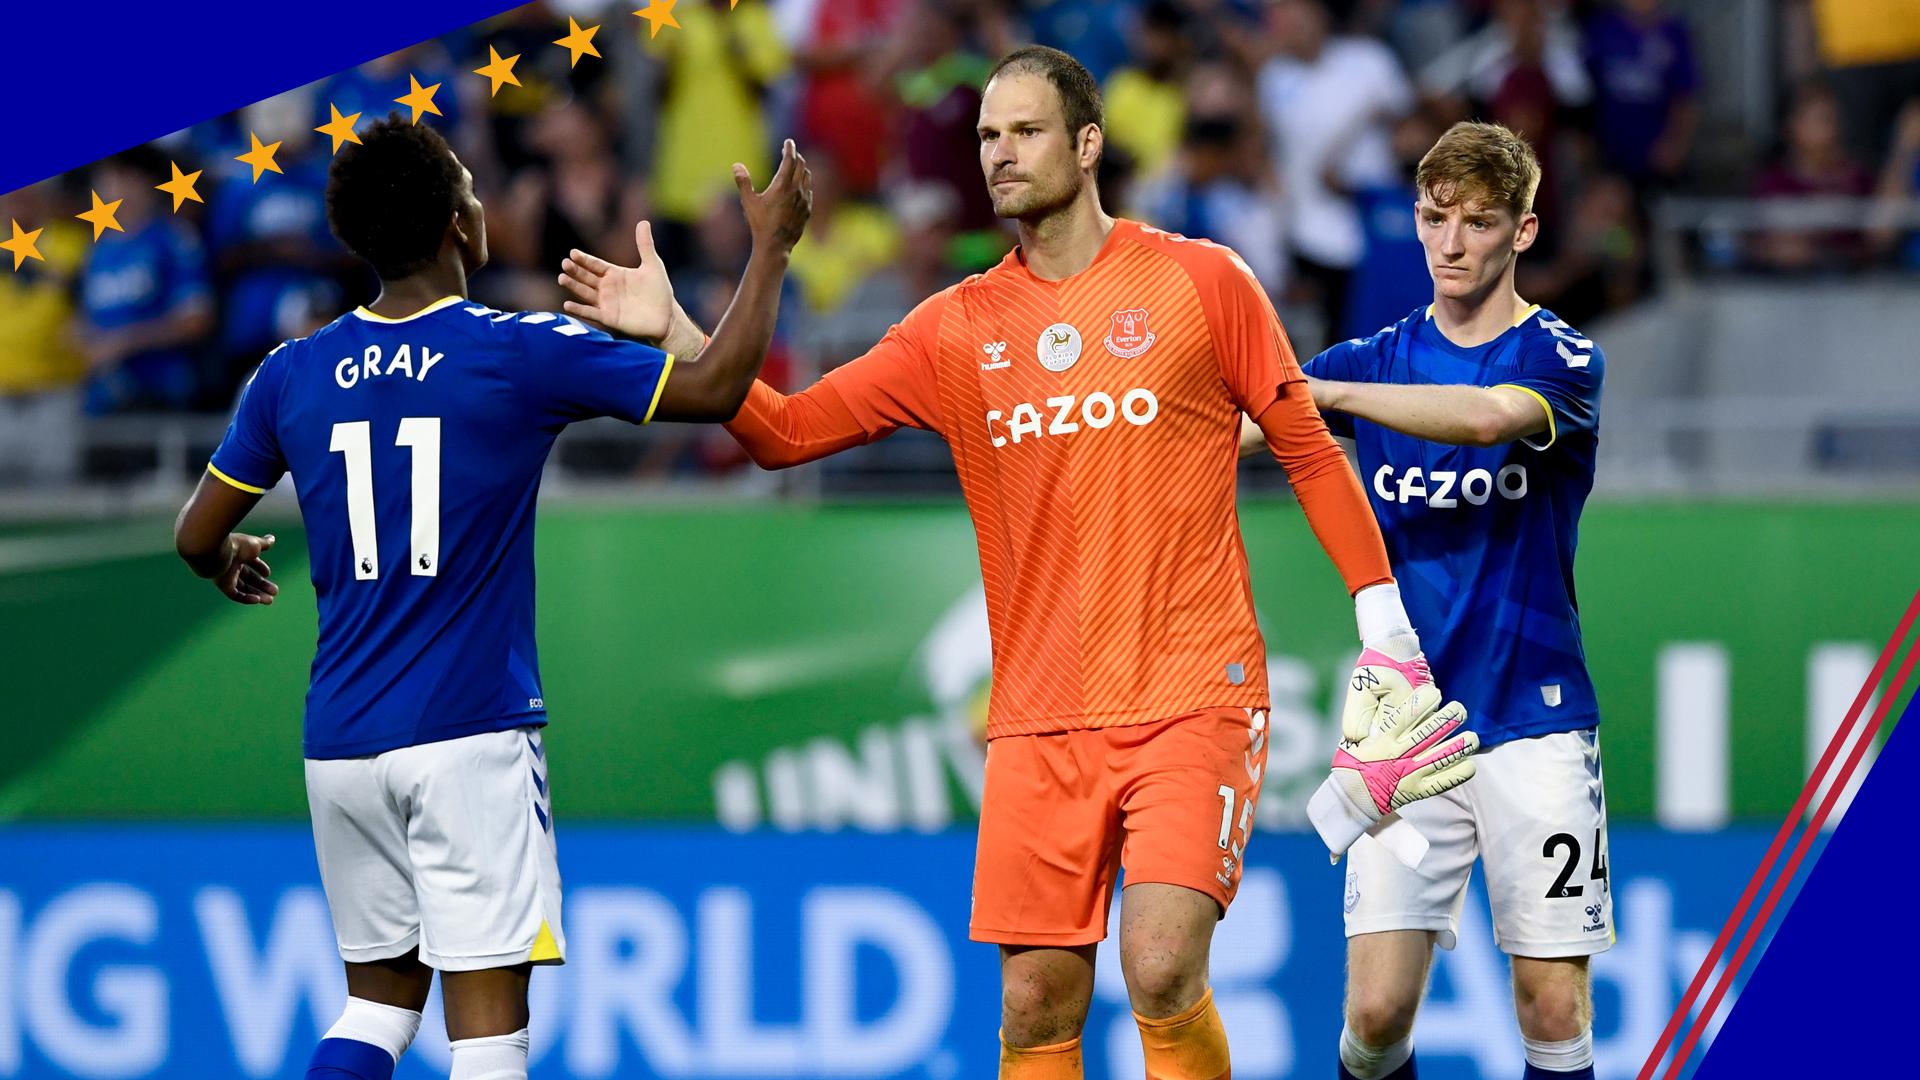 Begovic The Hero In Everton Shootout